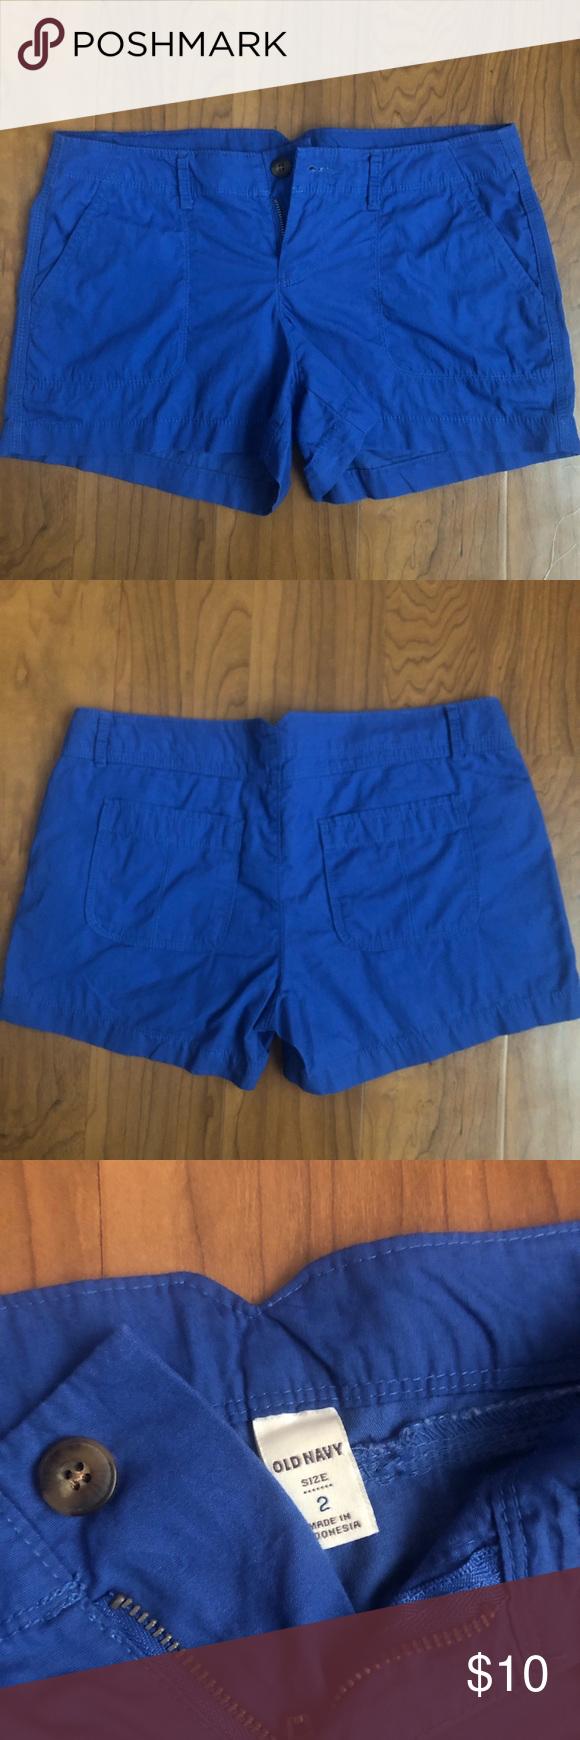 Old Navy Blue Shorts Blue Shorts Navy Blue Shorts Royal Blue Shorts,White Bathroom With Subway Tile